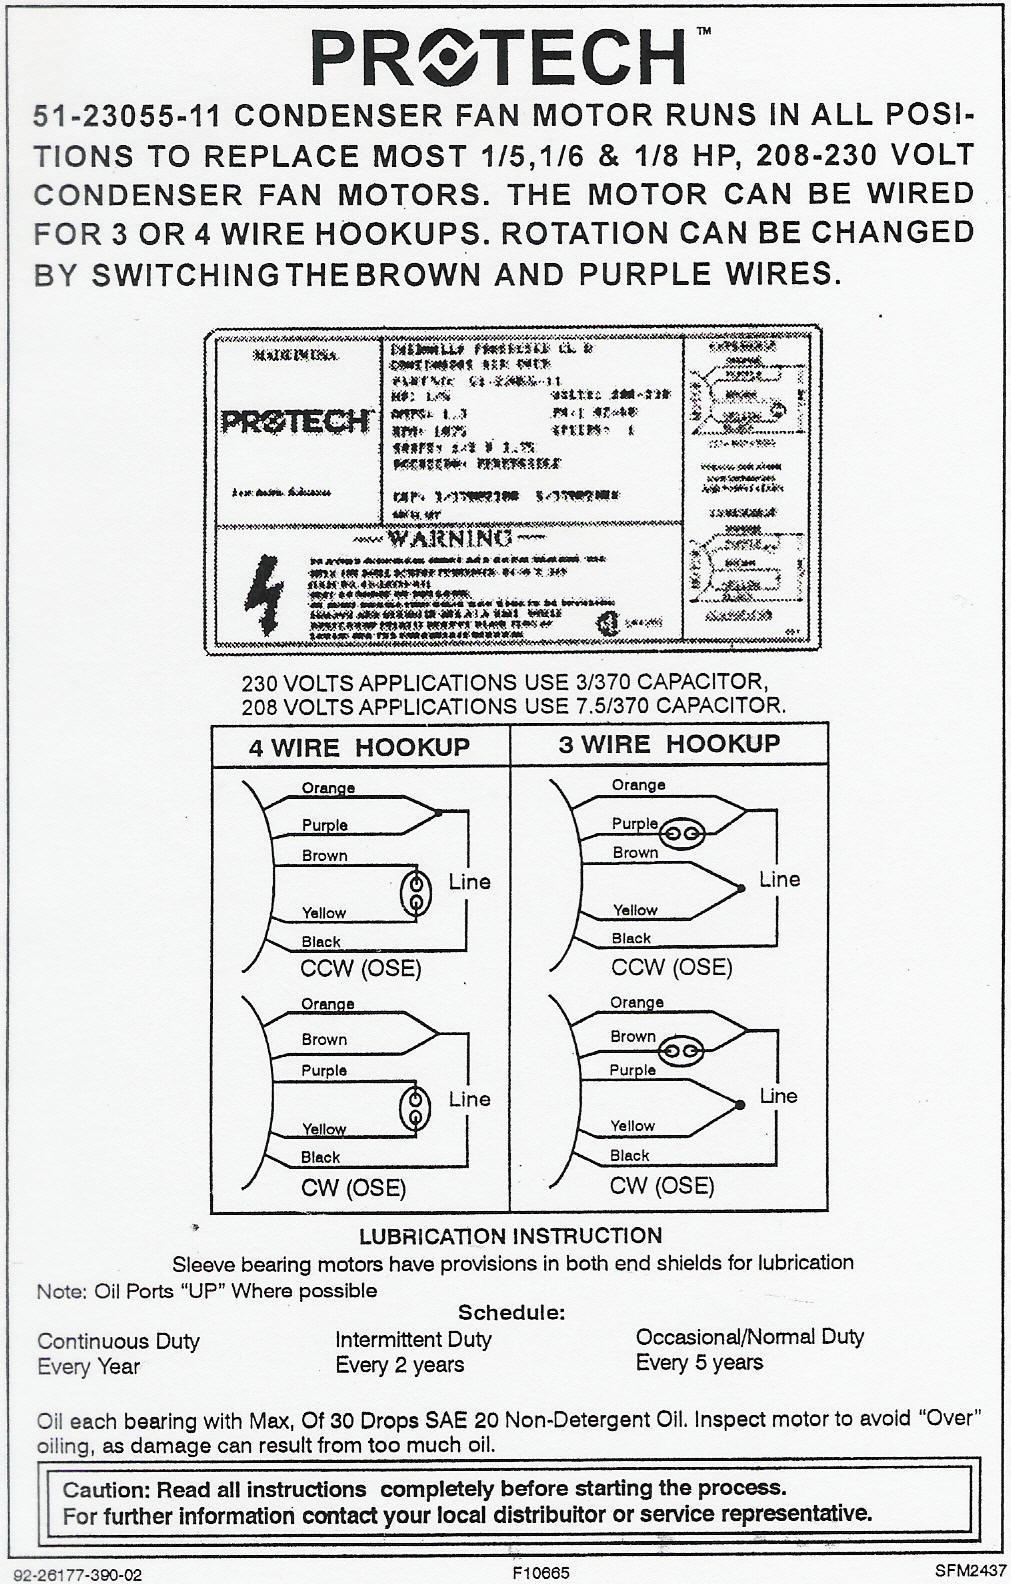 baldor three phase motor wiring diagram 1993 club car ac speed picture: